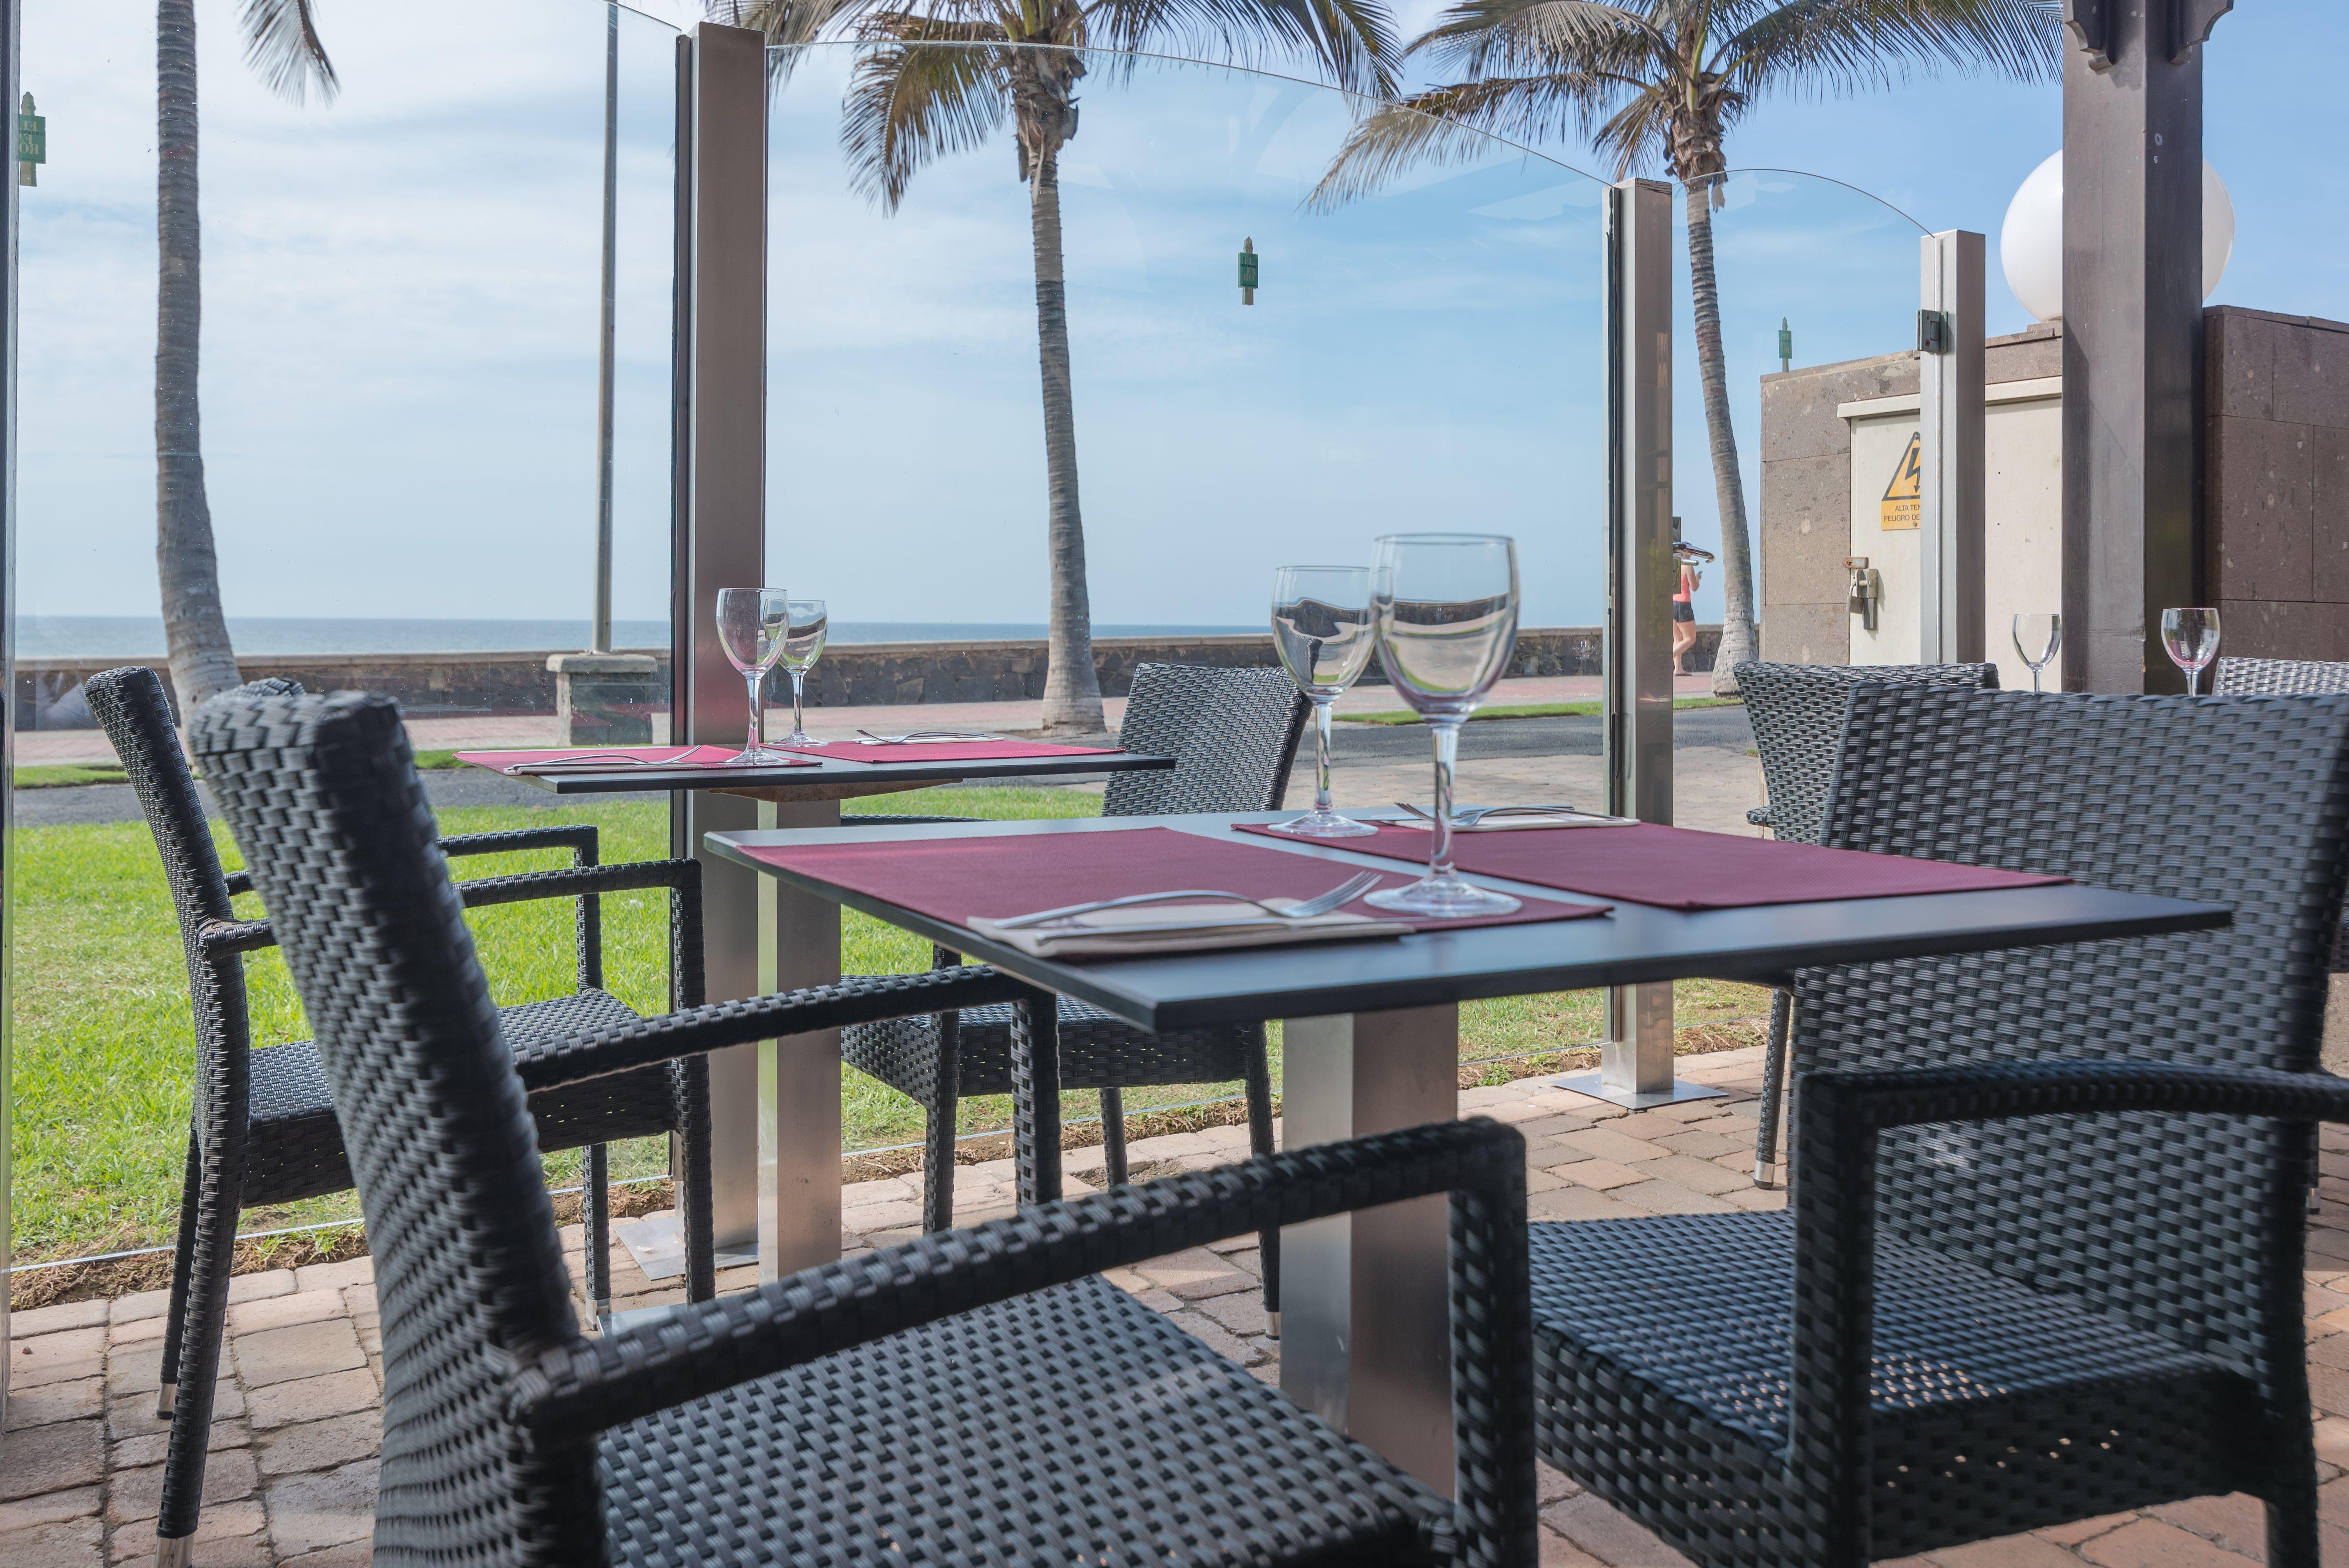 Foto 1 de Restaurante de comida fusión en San Bartolomé de Tirajana | Restaurante SushiMex